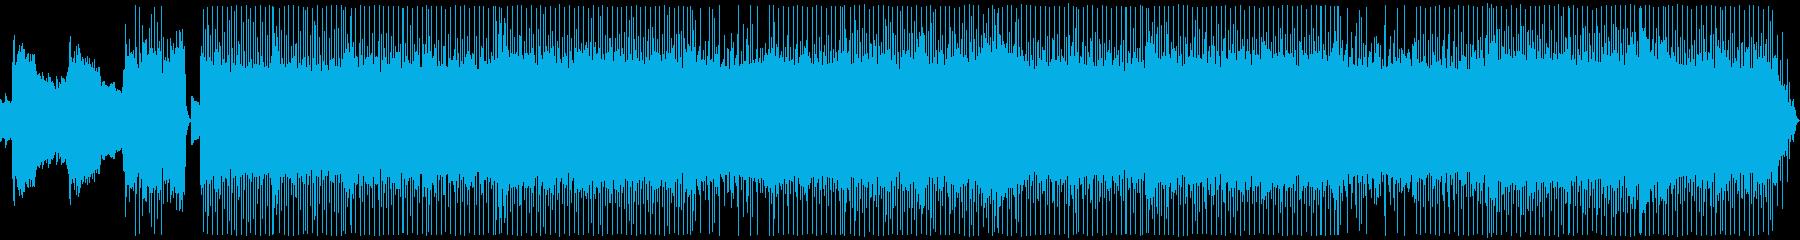 8bitとメタルの重厚なボス戦用BGMの再生済みの波形